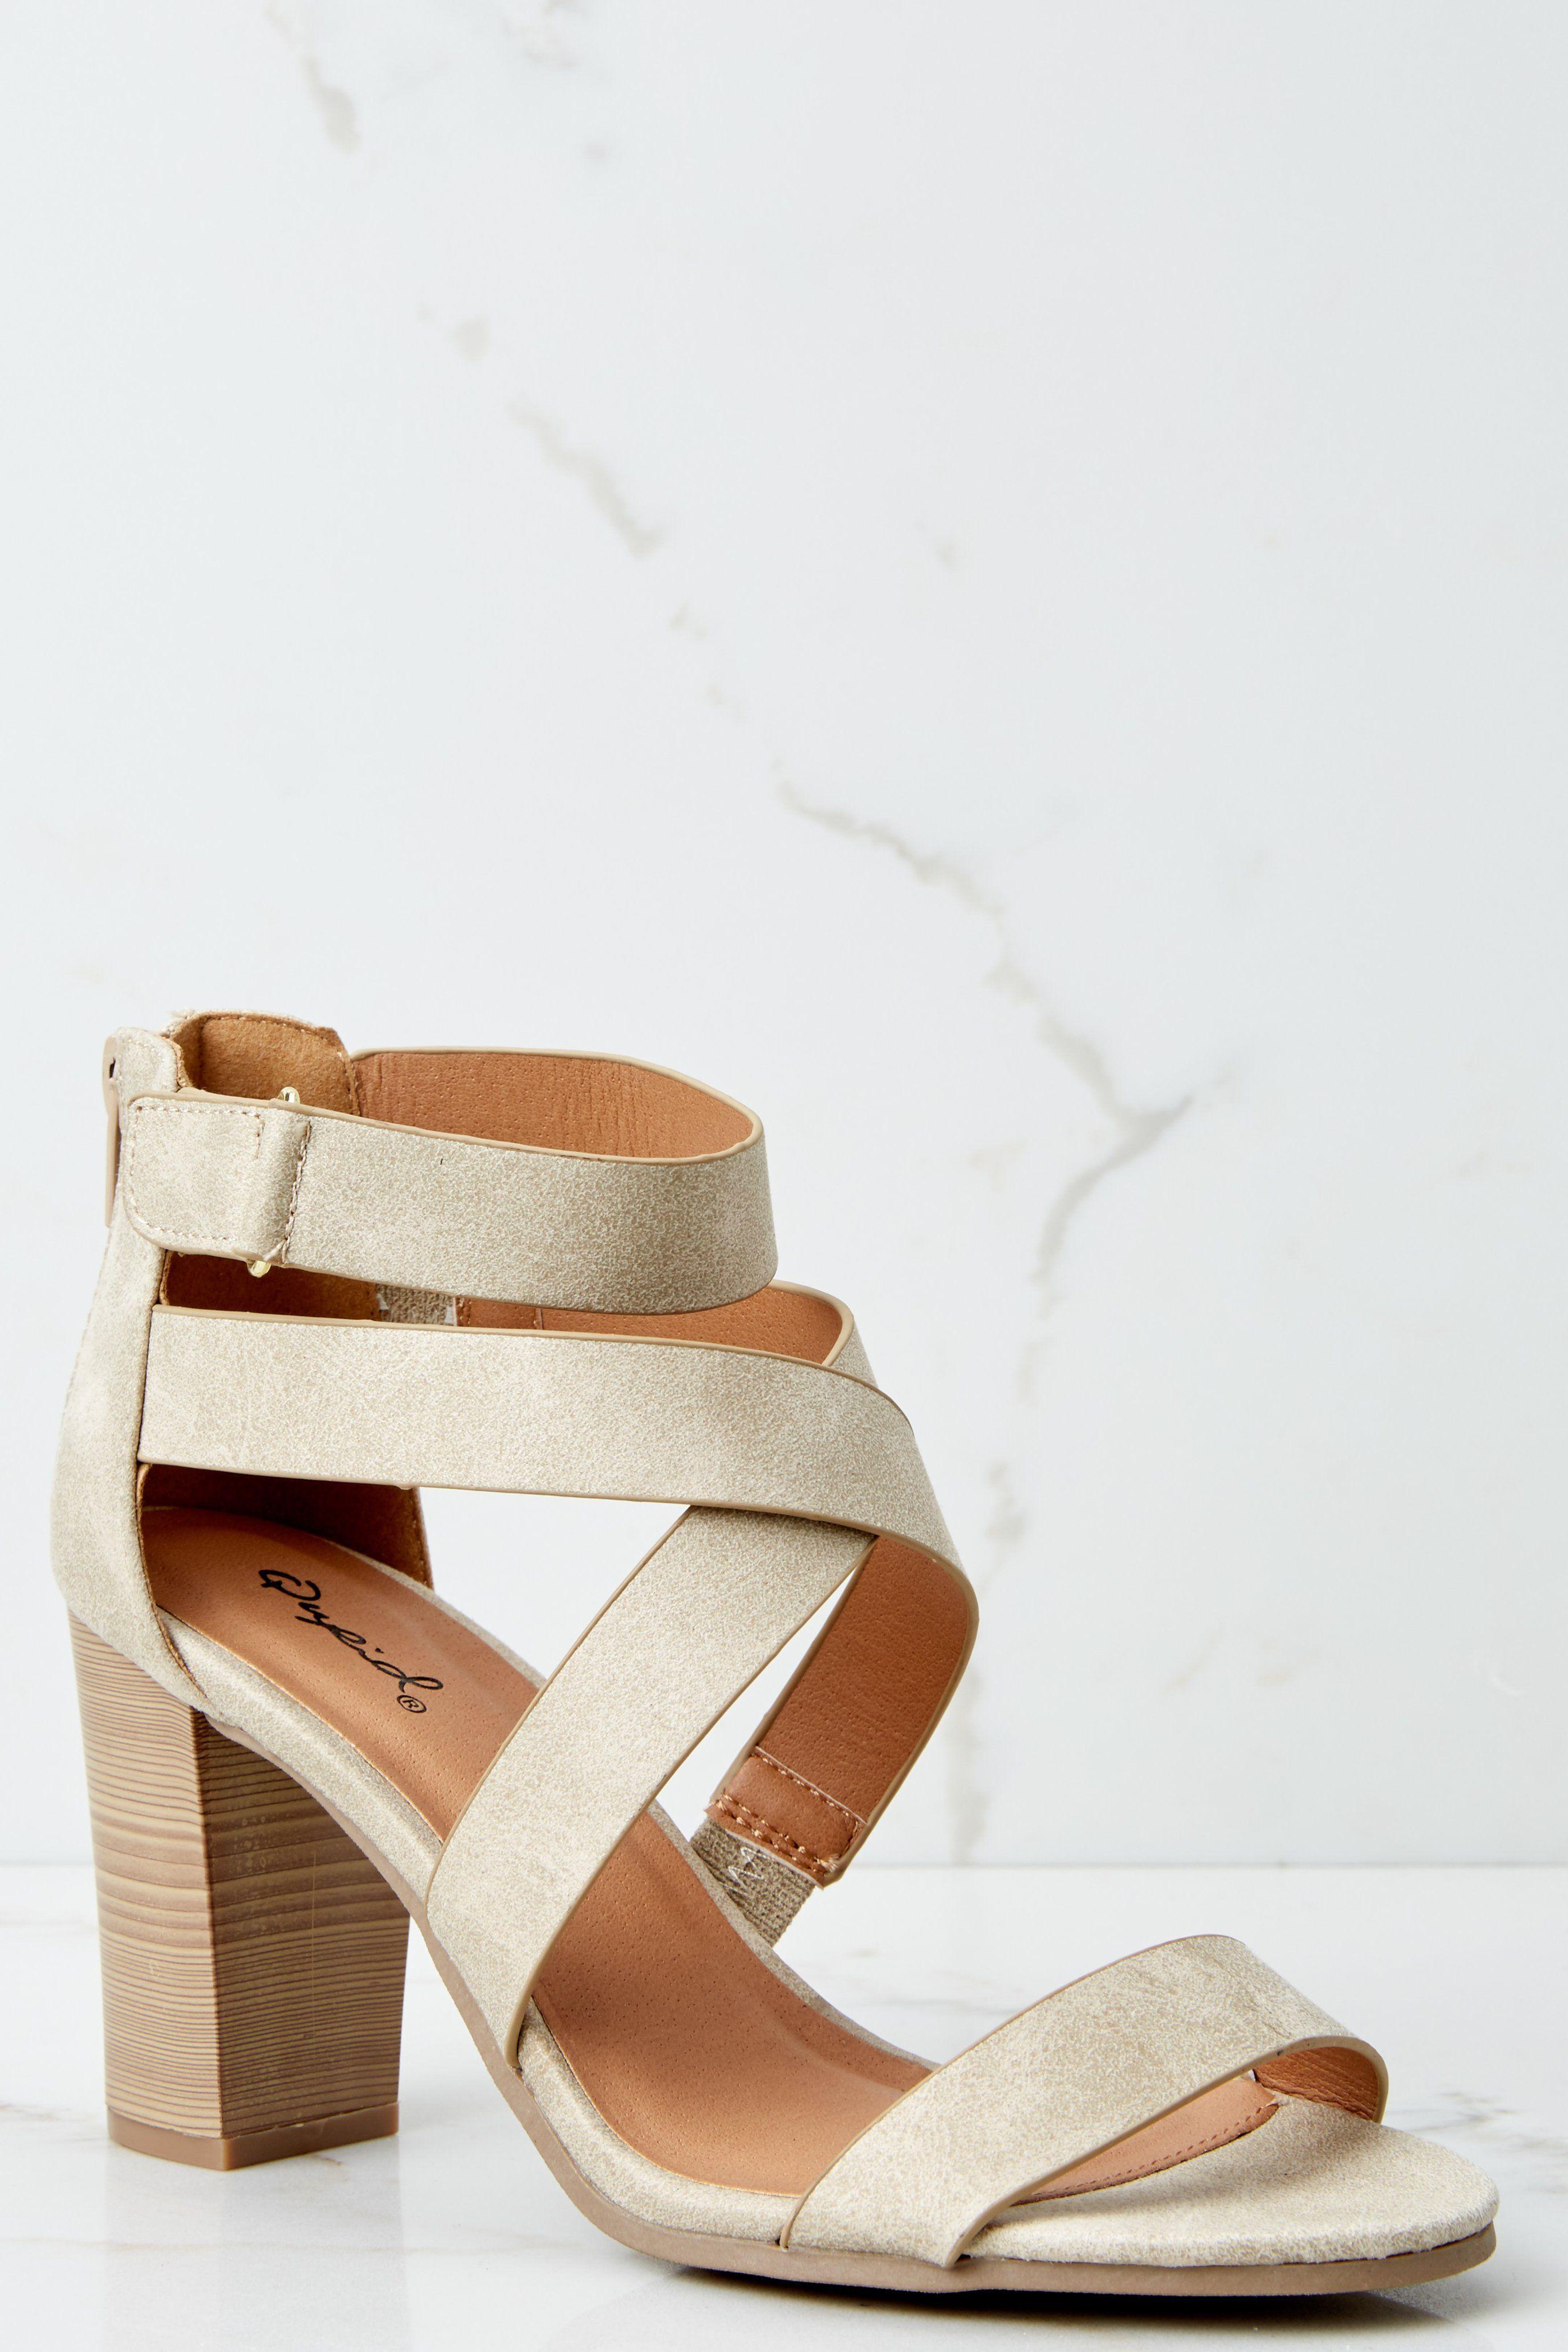 70f751b0b4c8 Trendy High Heel Sandals - Cute Ivory High Heel Sandals - High Heel Sandals  -  32.00 – Red Dress Boutique